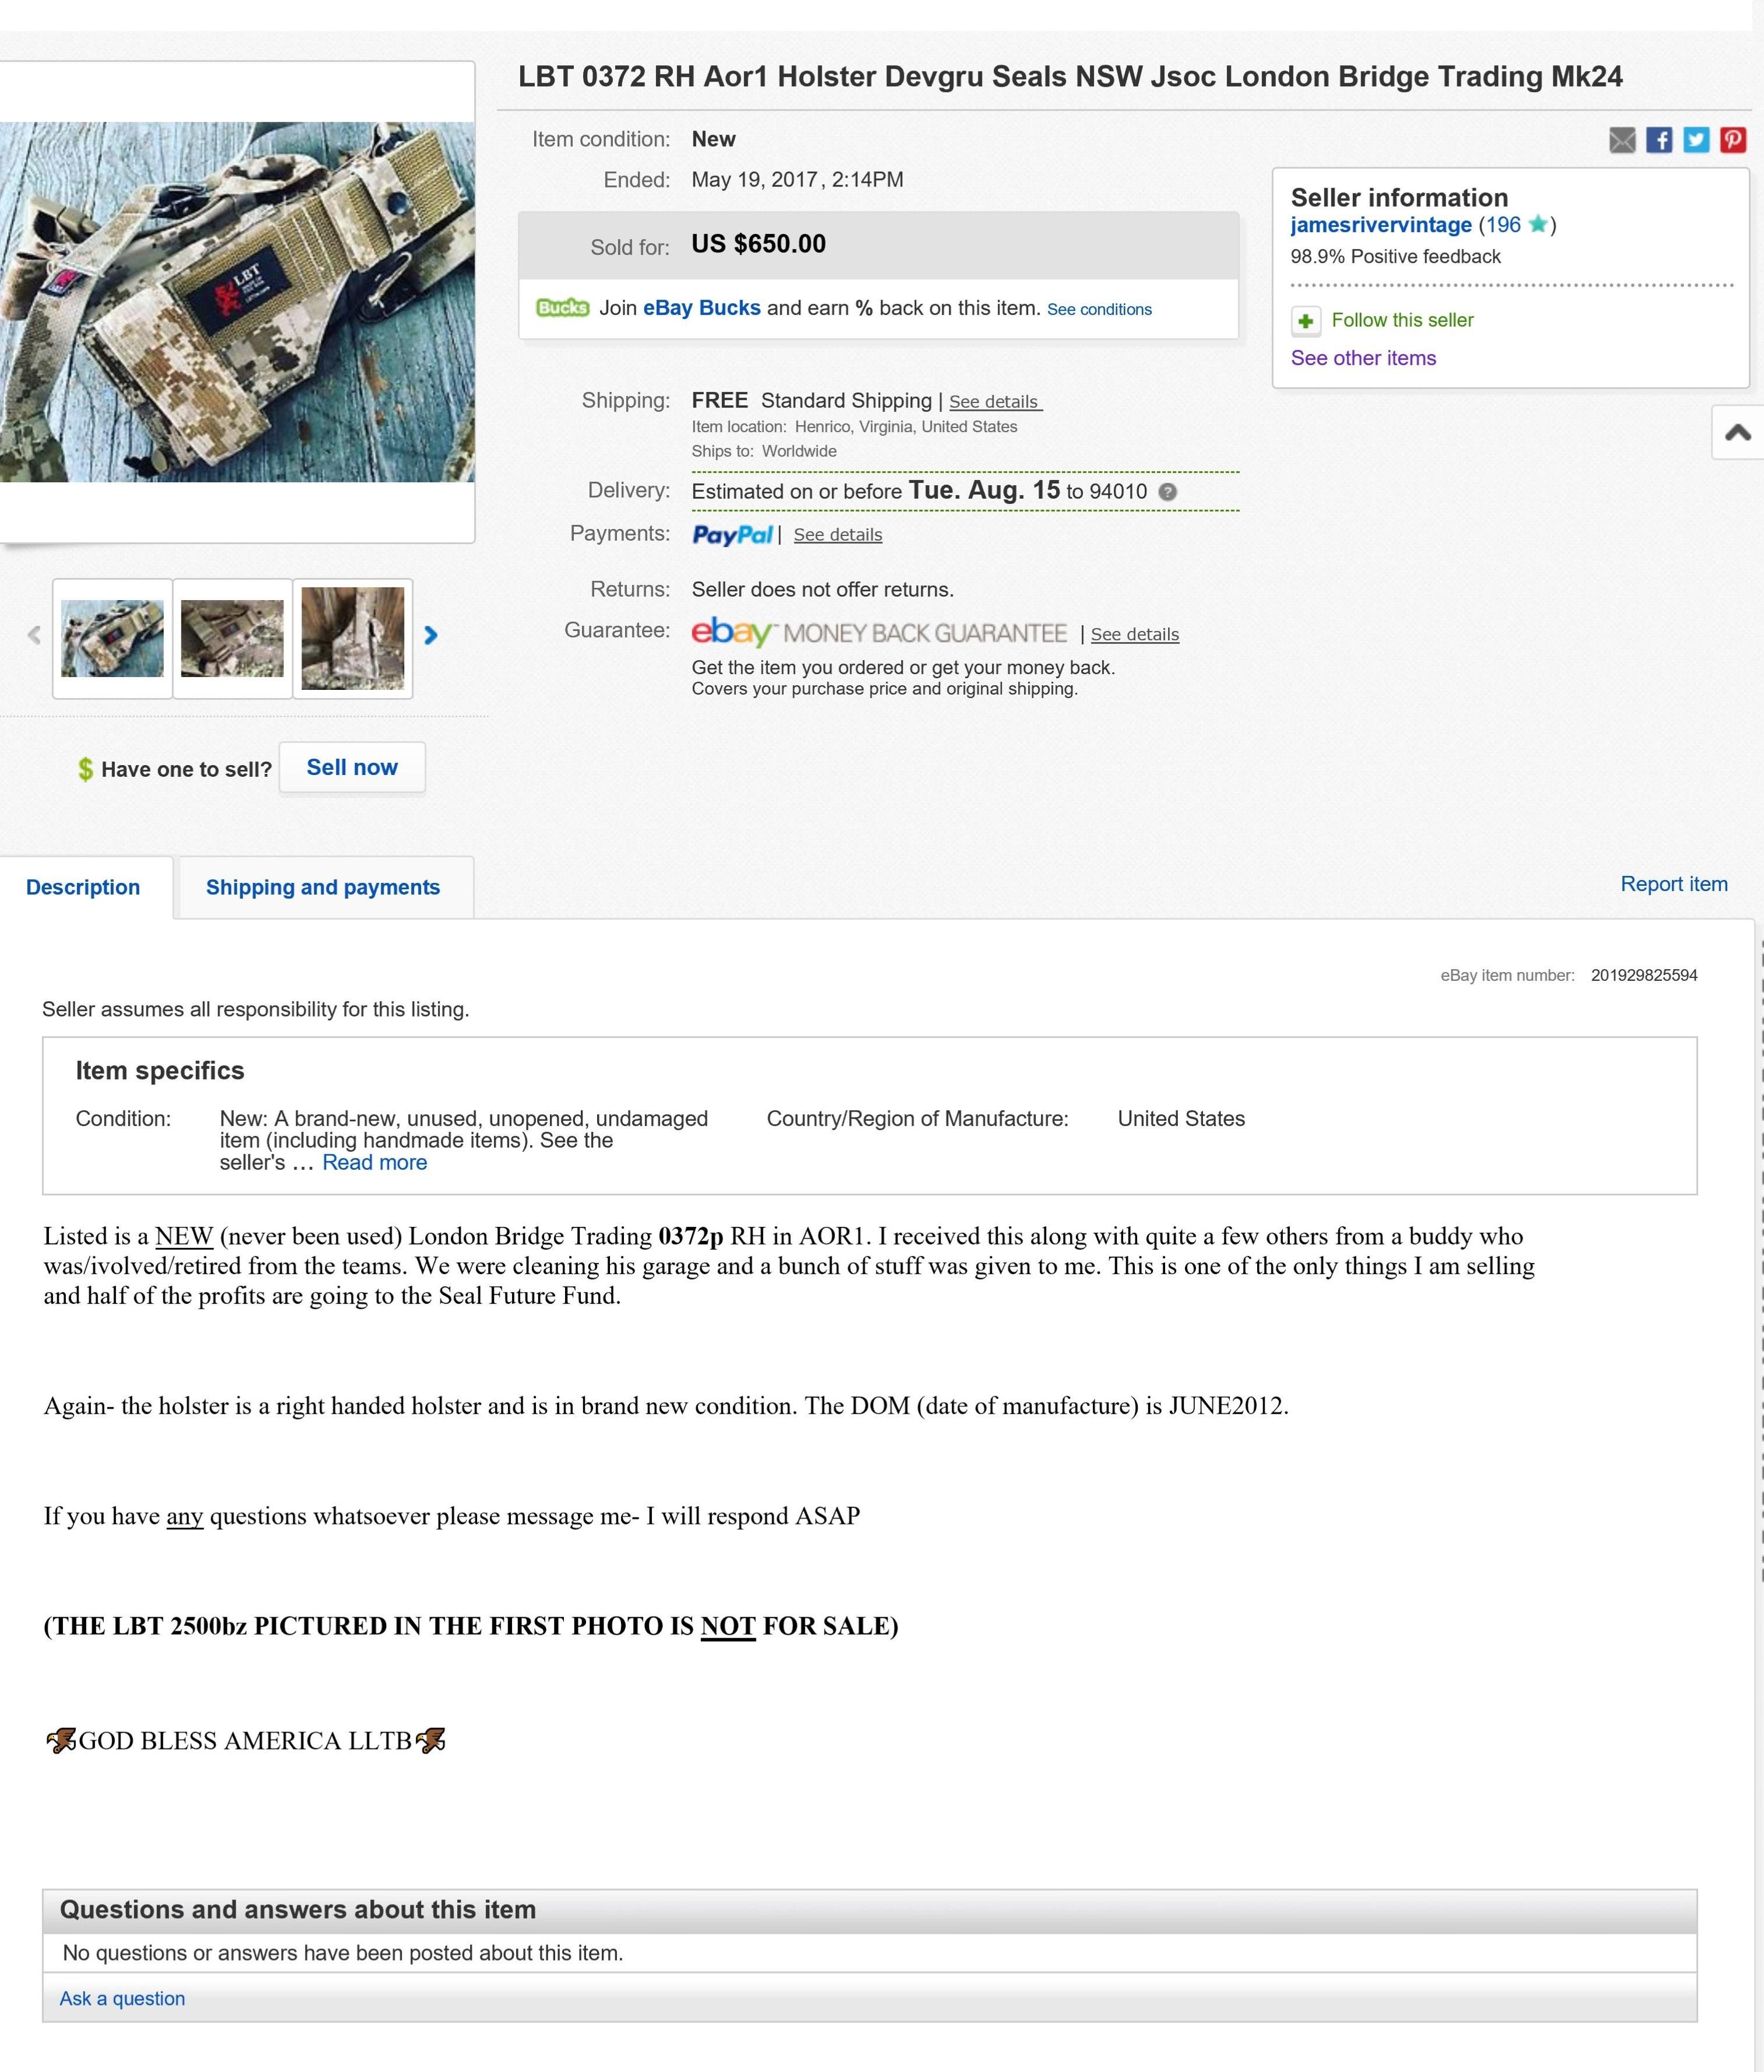 London Bridge Trading Co LTD MAS Grey H&K 416 417 MP7 MK24 HK45CT Operator Kit (Rare)-us-navy-seal-foundation-scam-artist-ebay.jpg